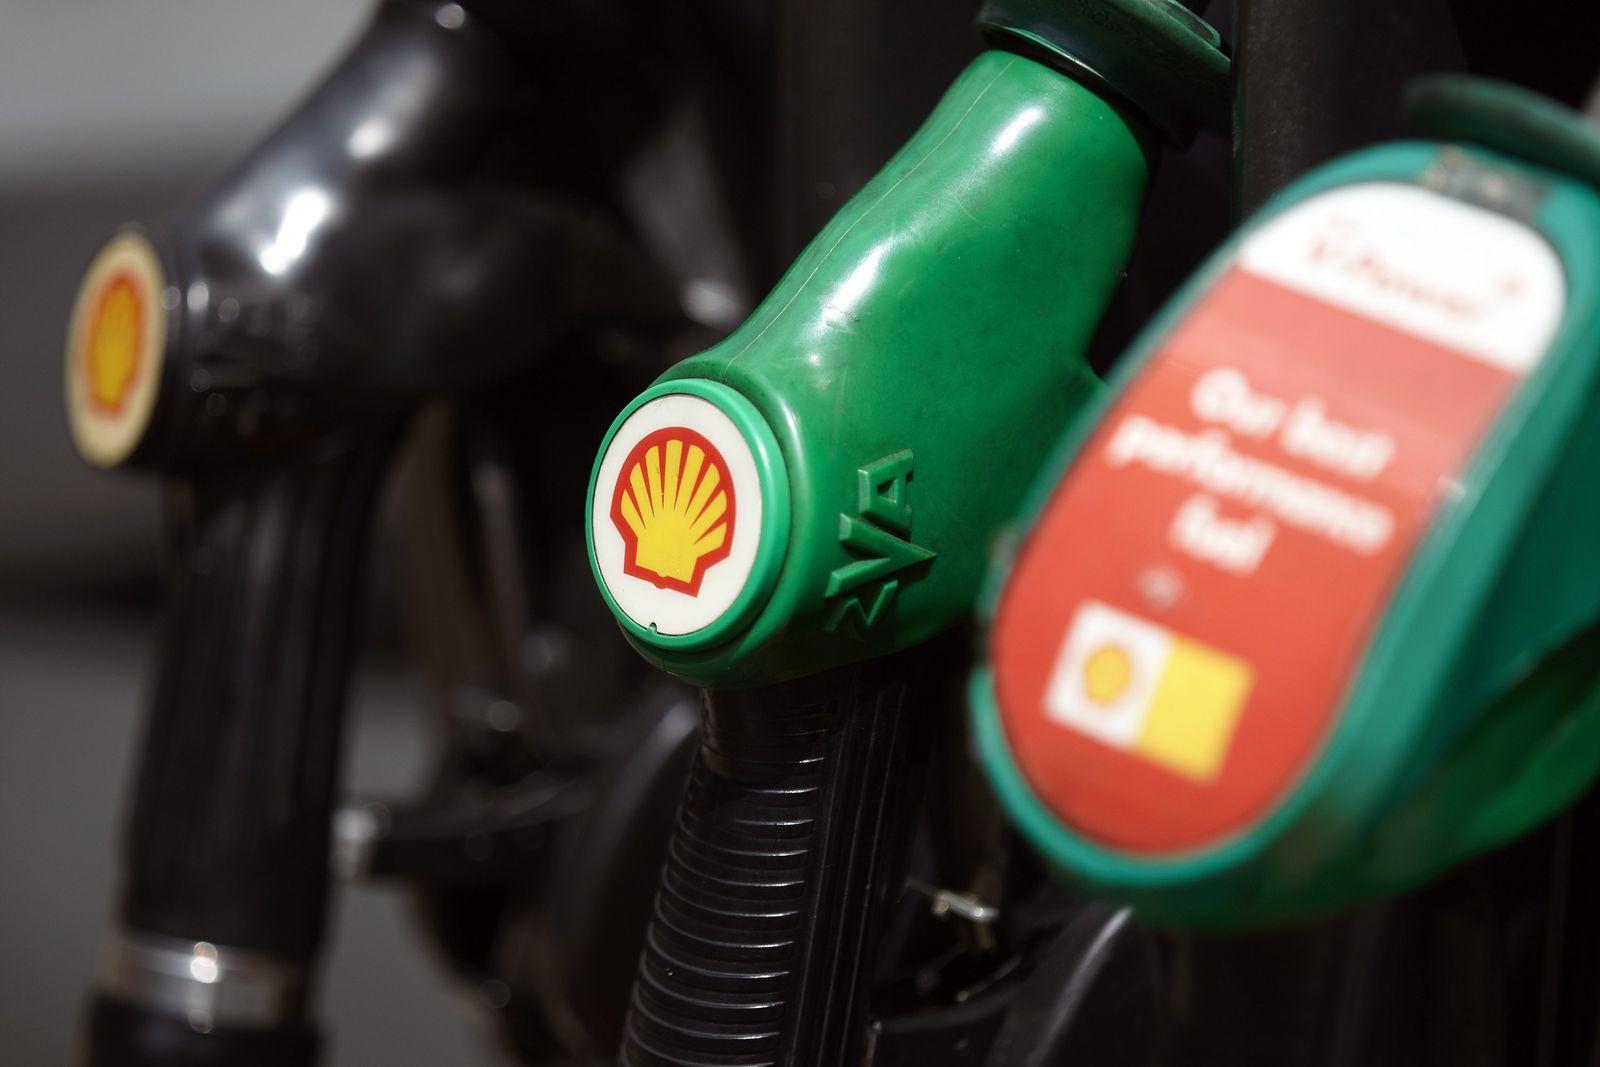 Royal Dutch Shell / Tankstelle / Zapfsäule / Benzin / Diesel / Kraftstoffe